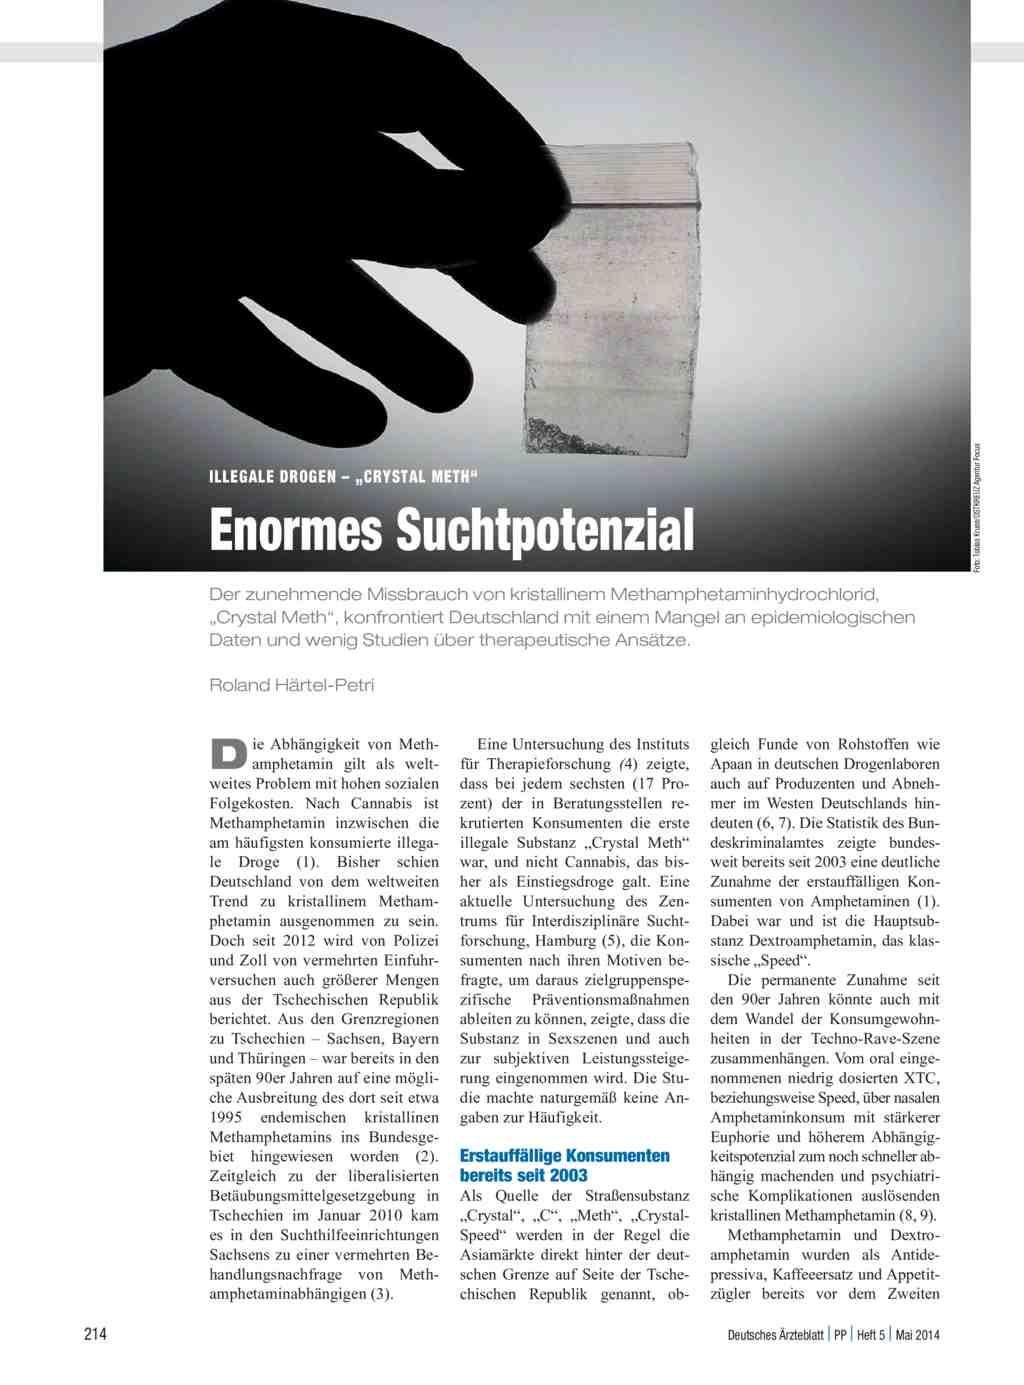 side effects medic ine prednisone